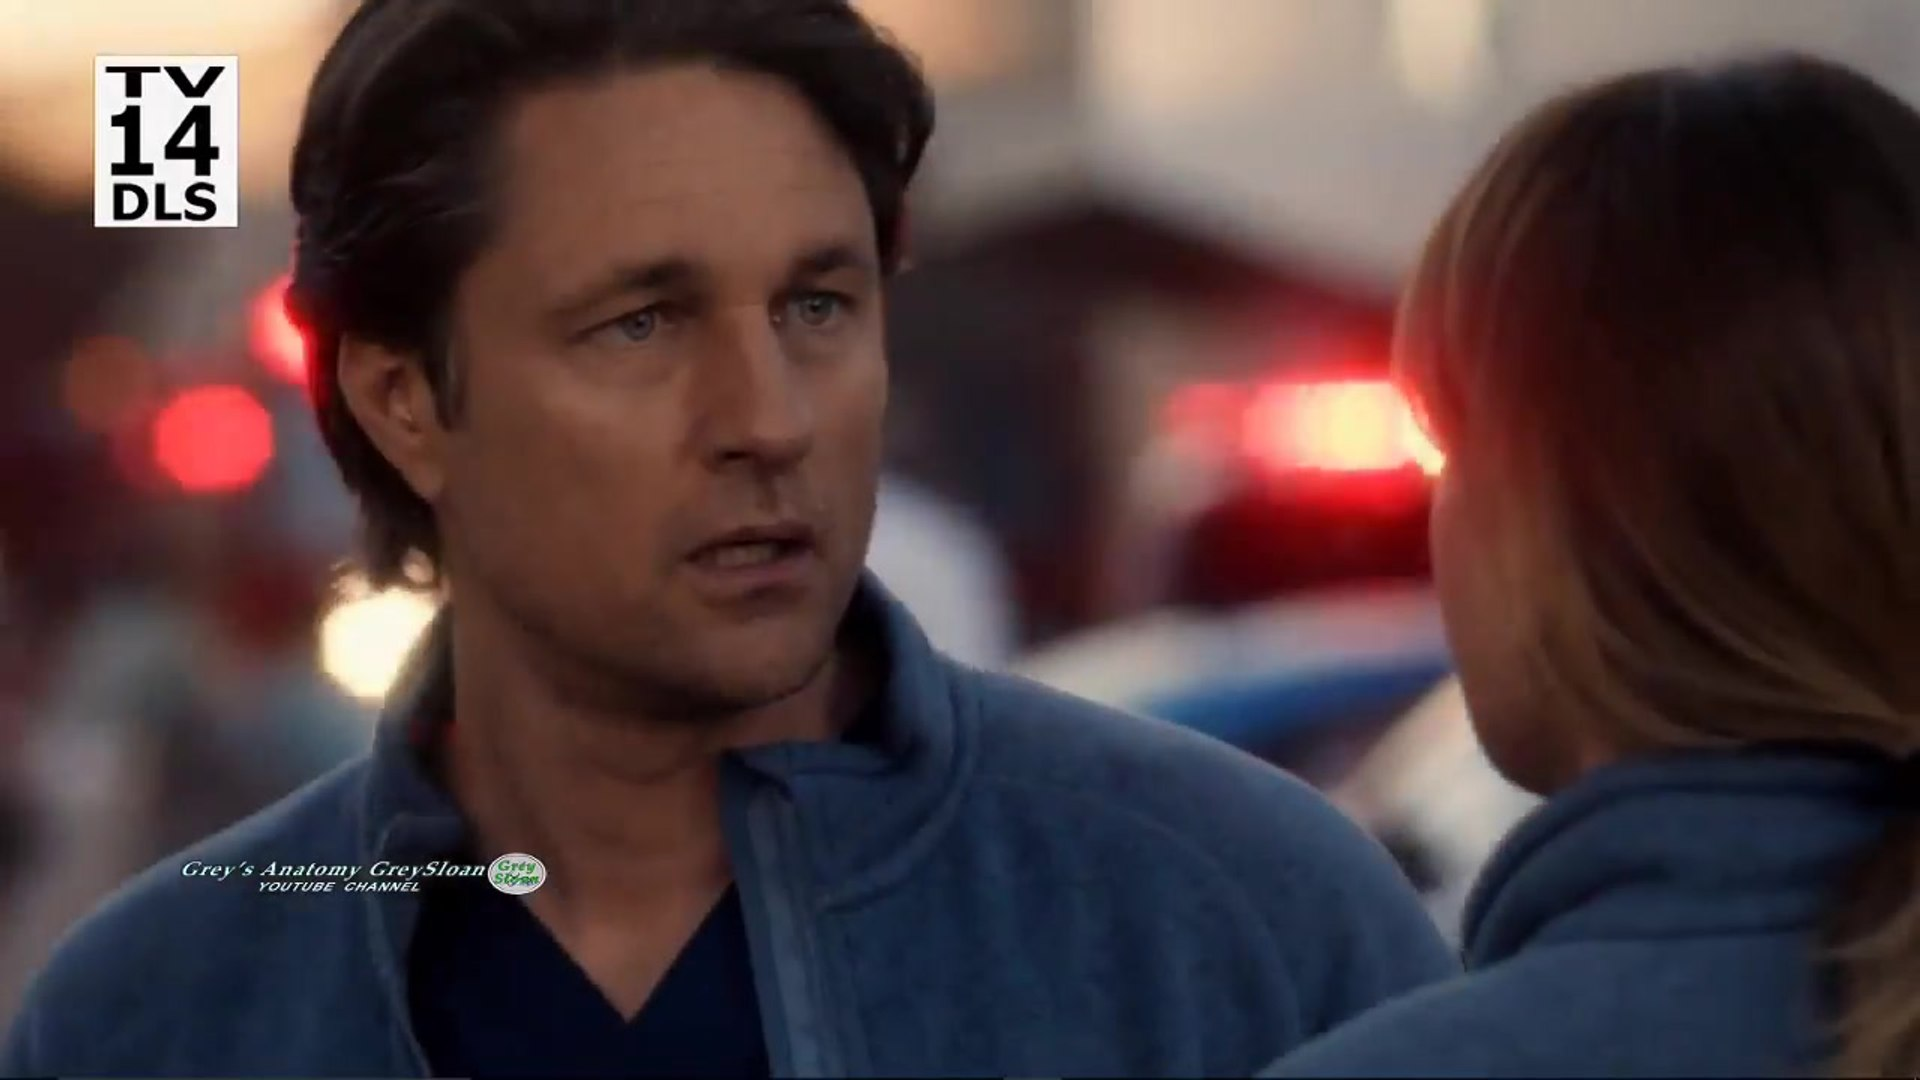 15 Temporada De Grey's Anatomy Assistir grey's anatomy season 14 episode 12 014x012 [[streaming]]